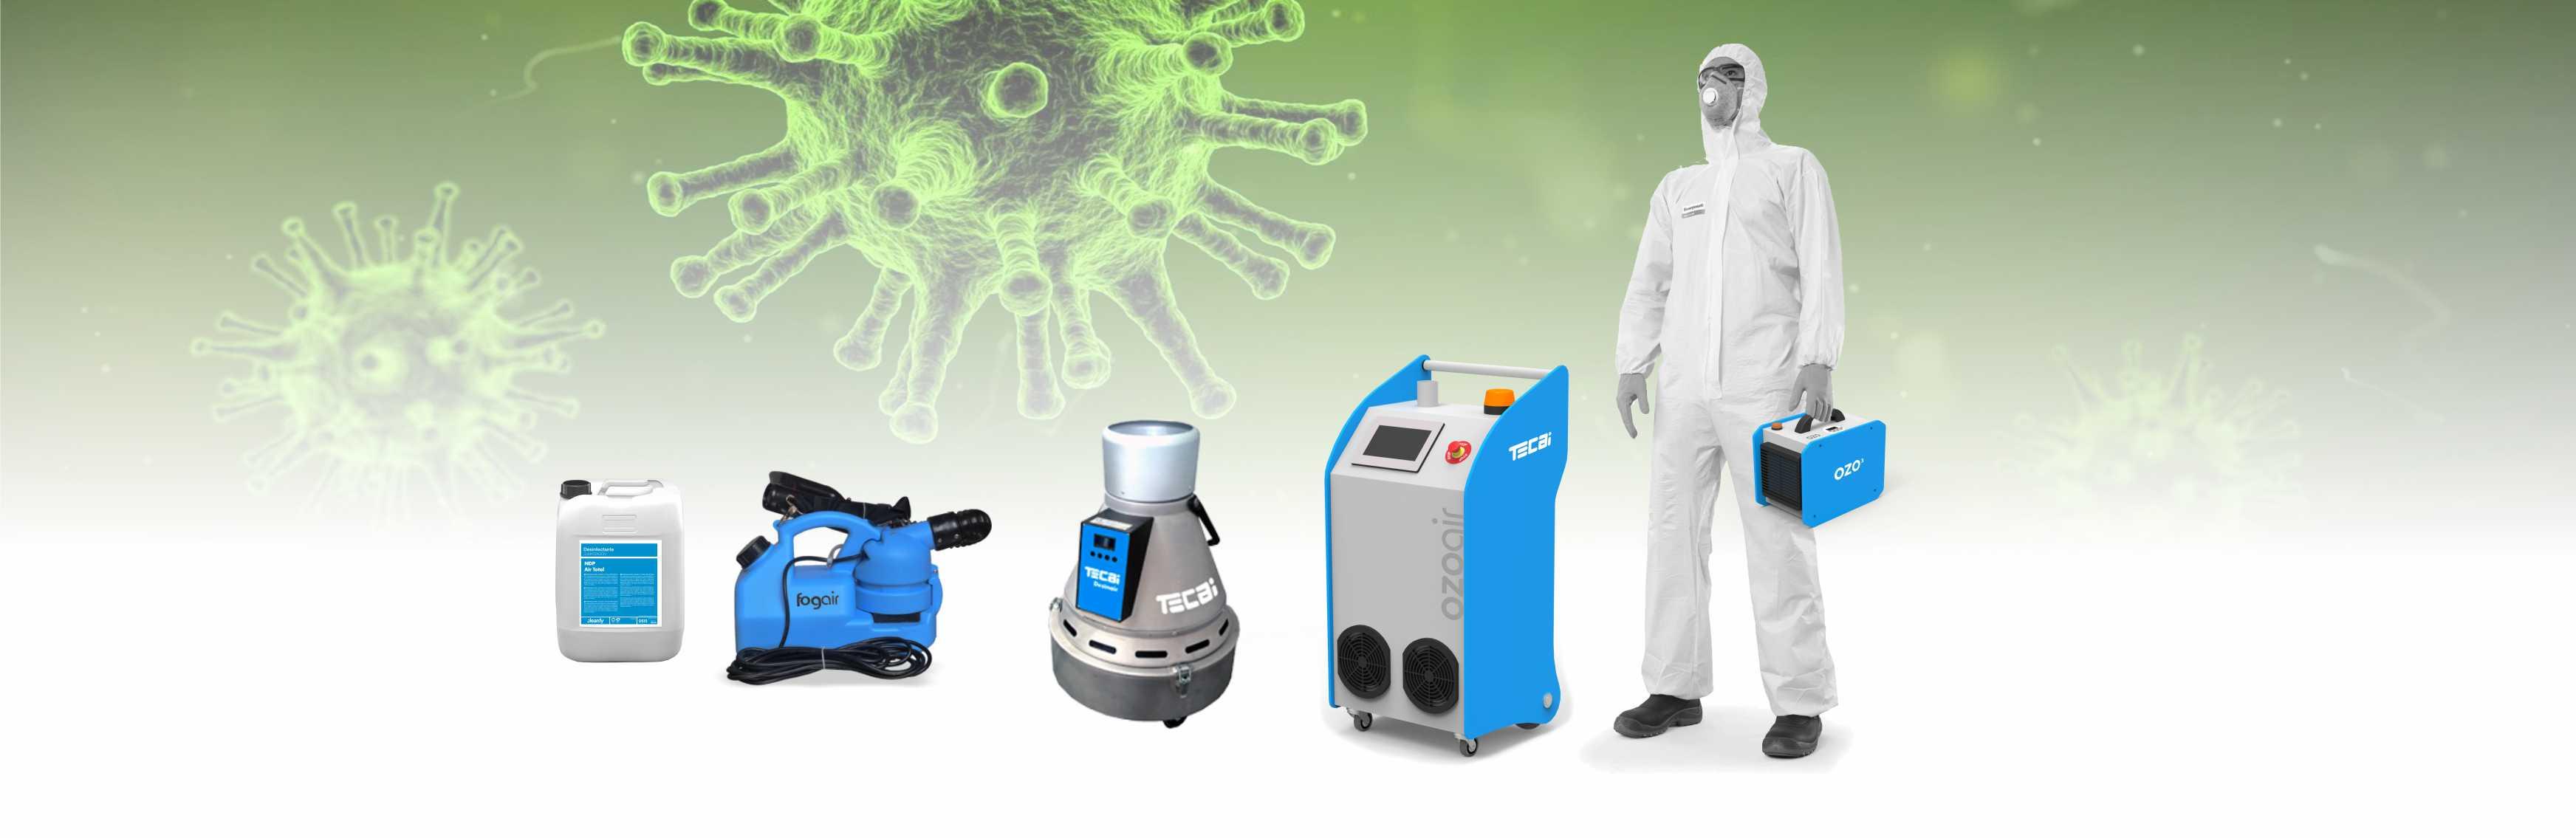 equipos desinfeccion virus